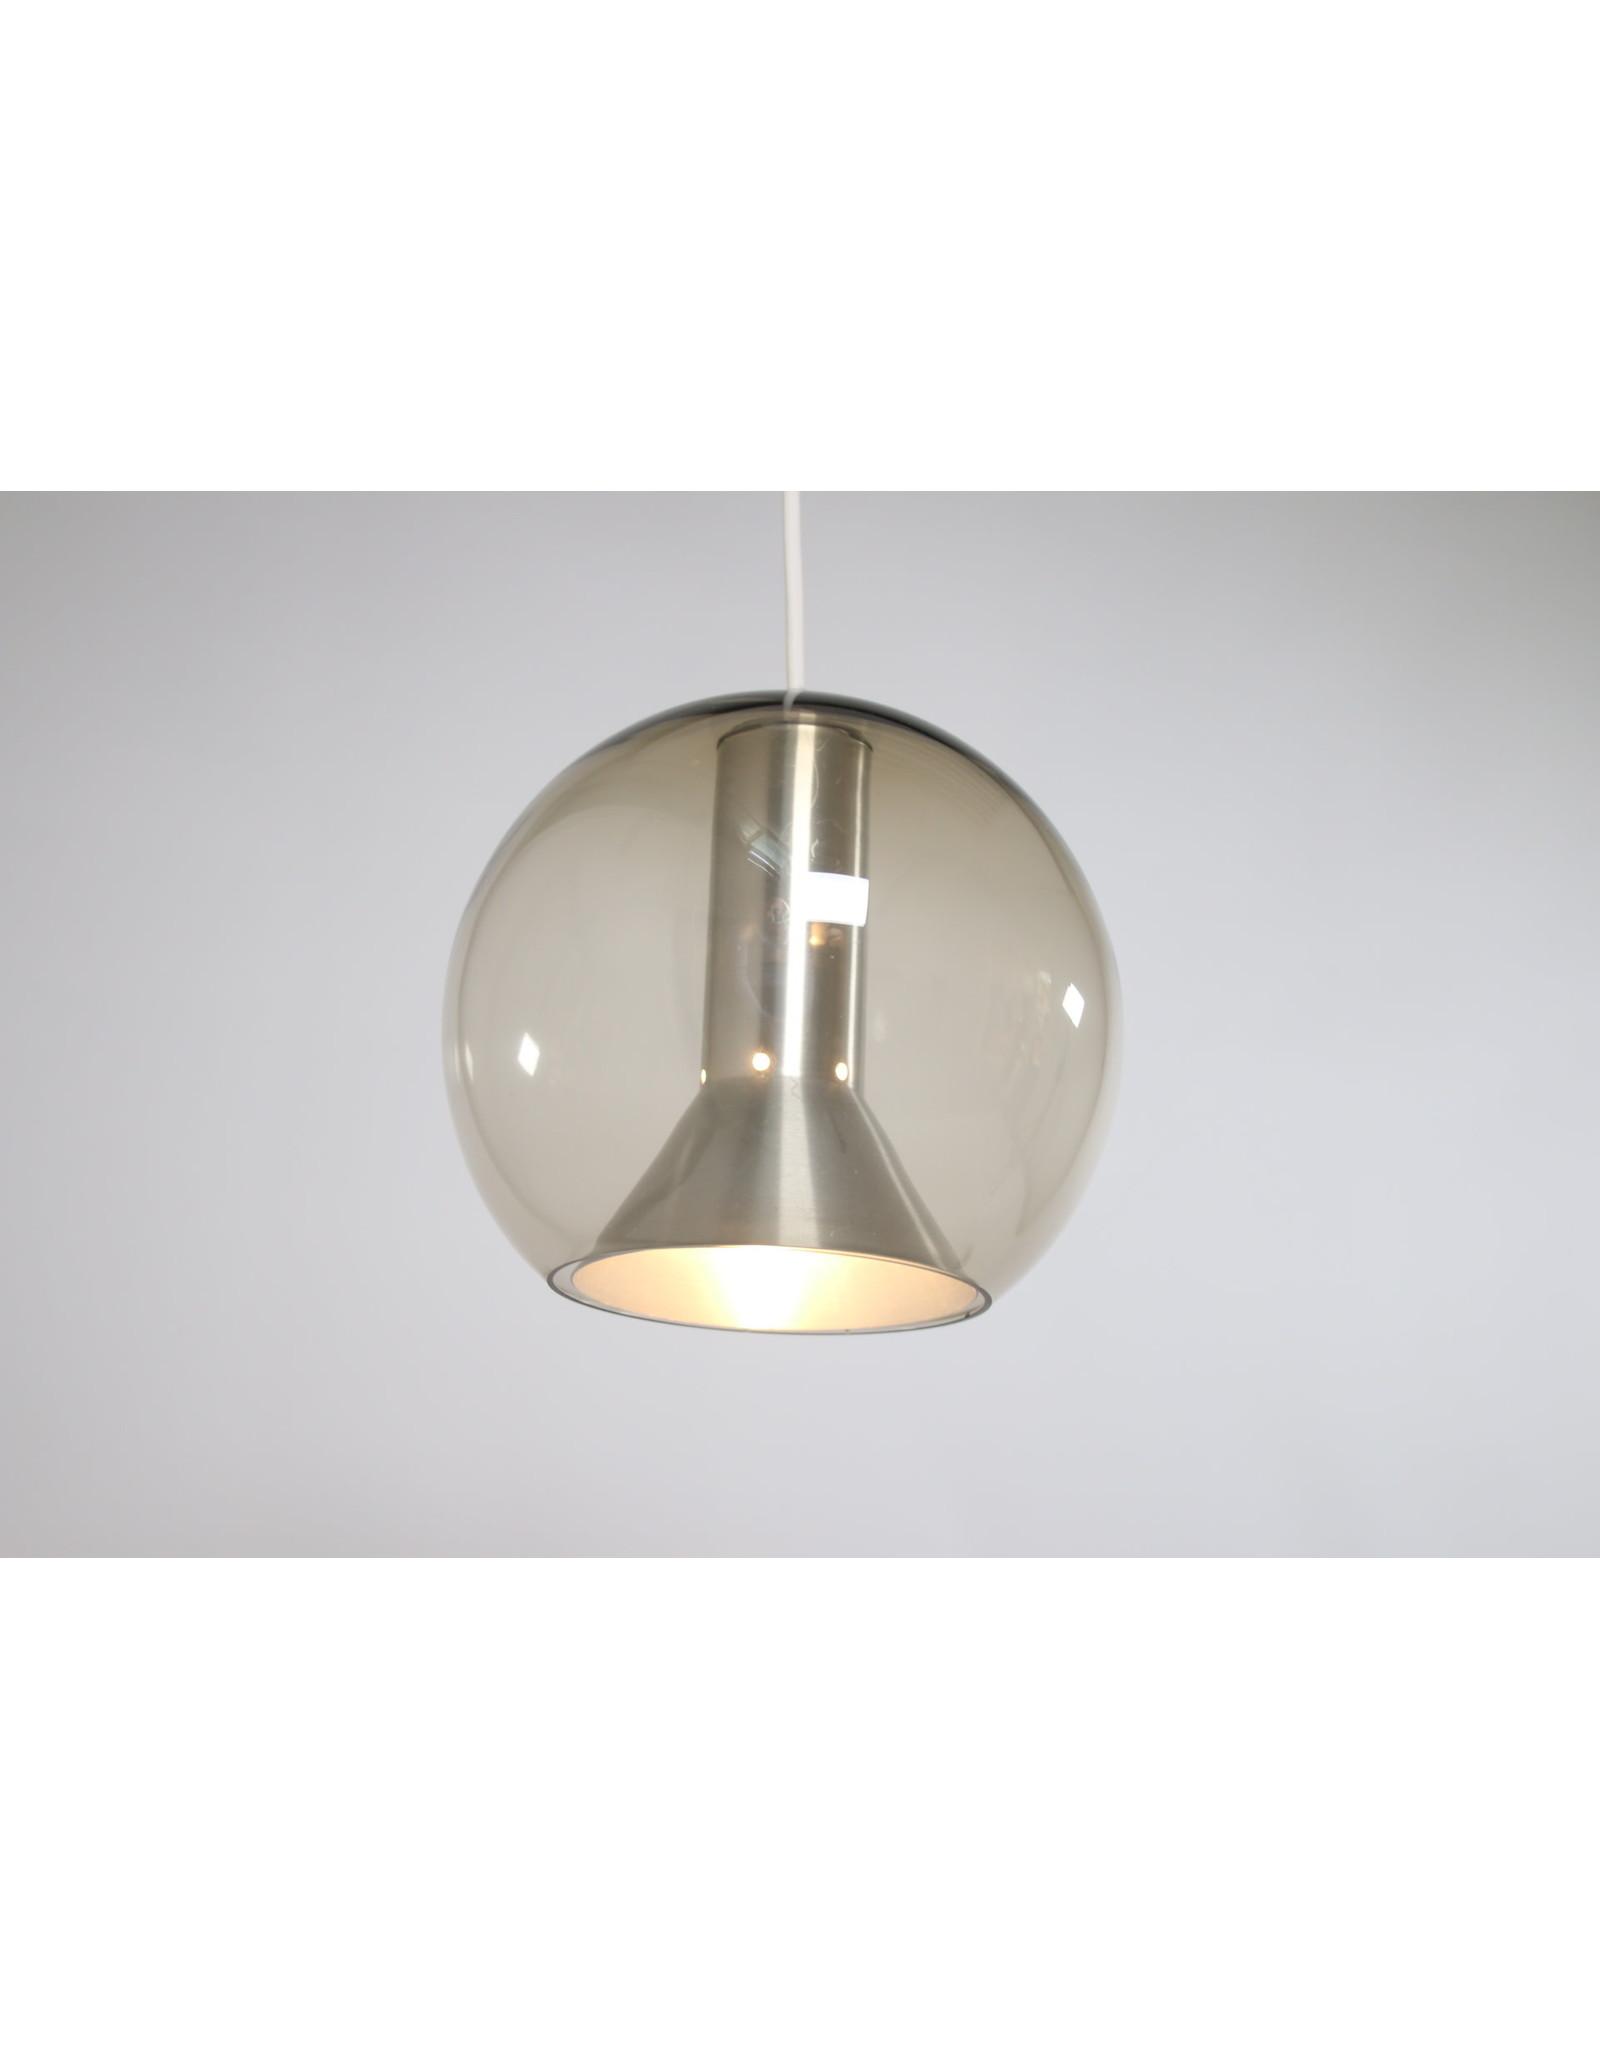 Raak Amsterdam vintage bol hanglamp jaren 60